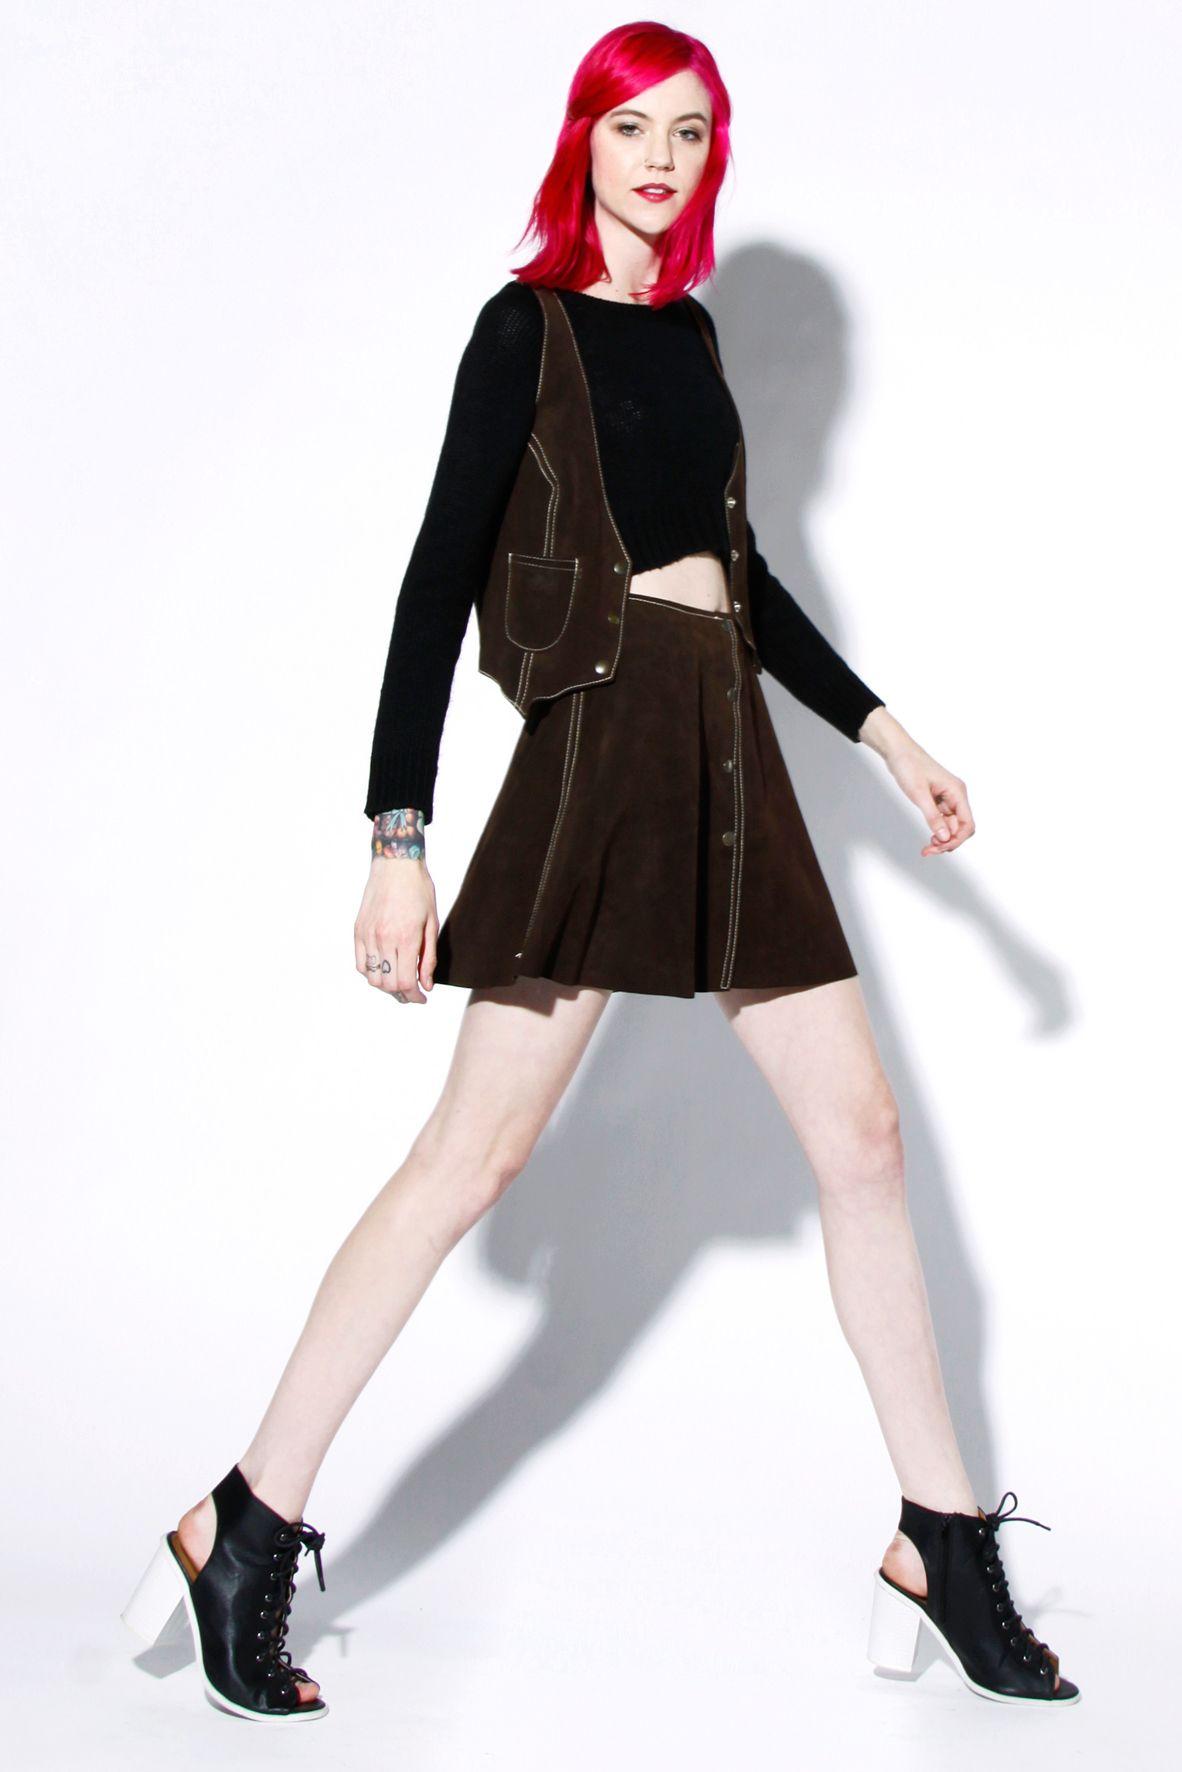 Deadstock Vintage 70s Suede Leather Snap Up Skirt + Vest Set   Thrifted & Modern #70s #suede #suedeskirt #vintage #thriftedandmodern #pinkhair